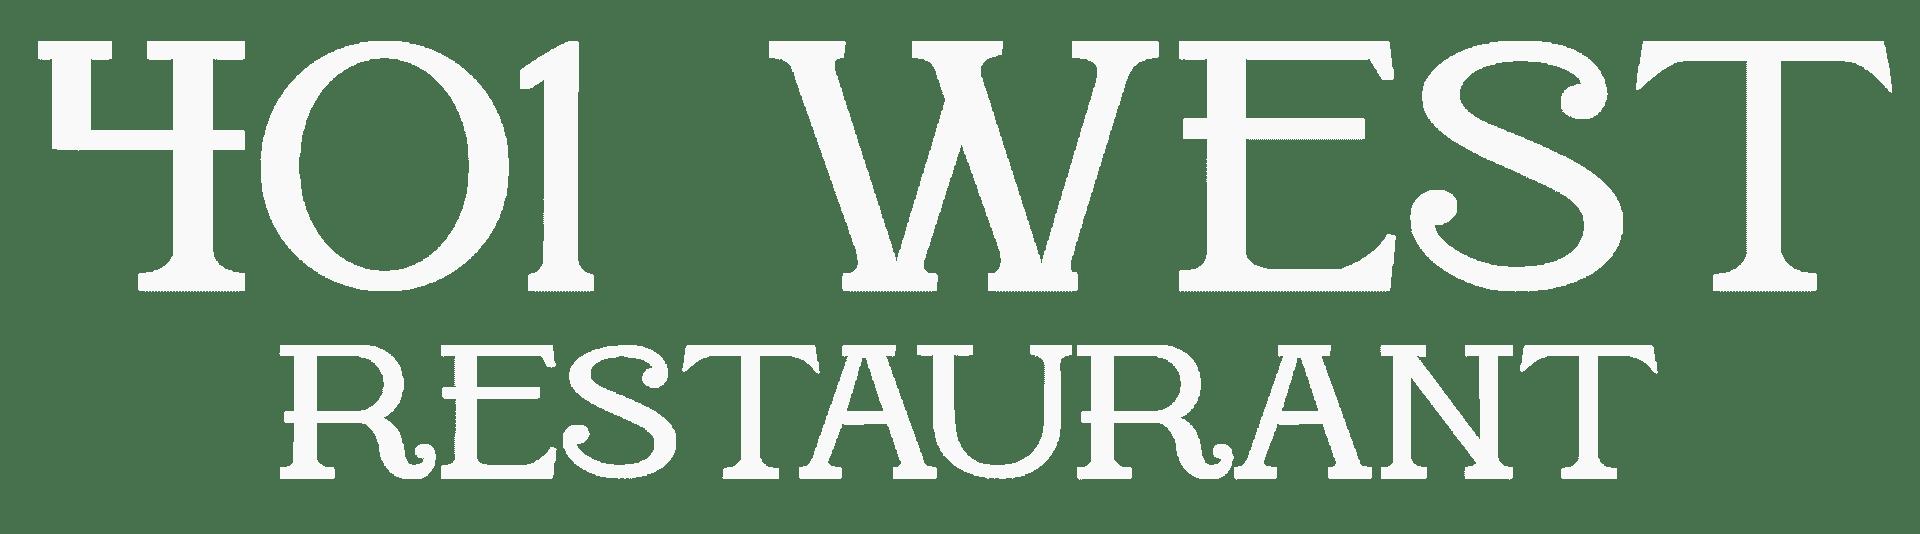 401 West Logo